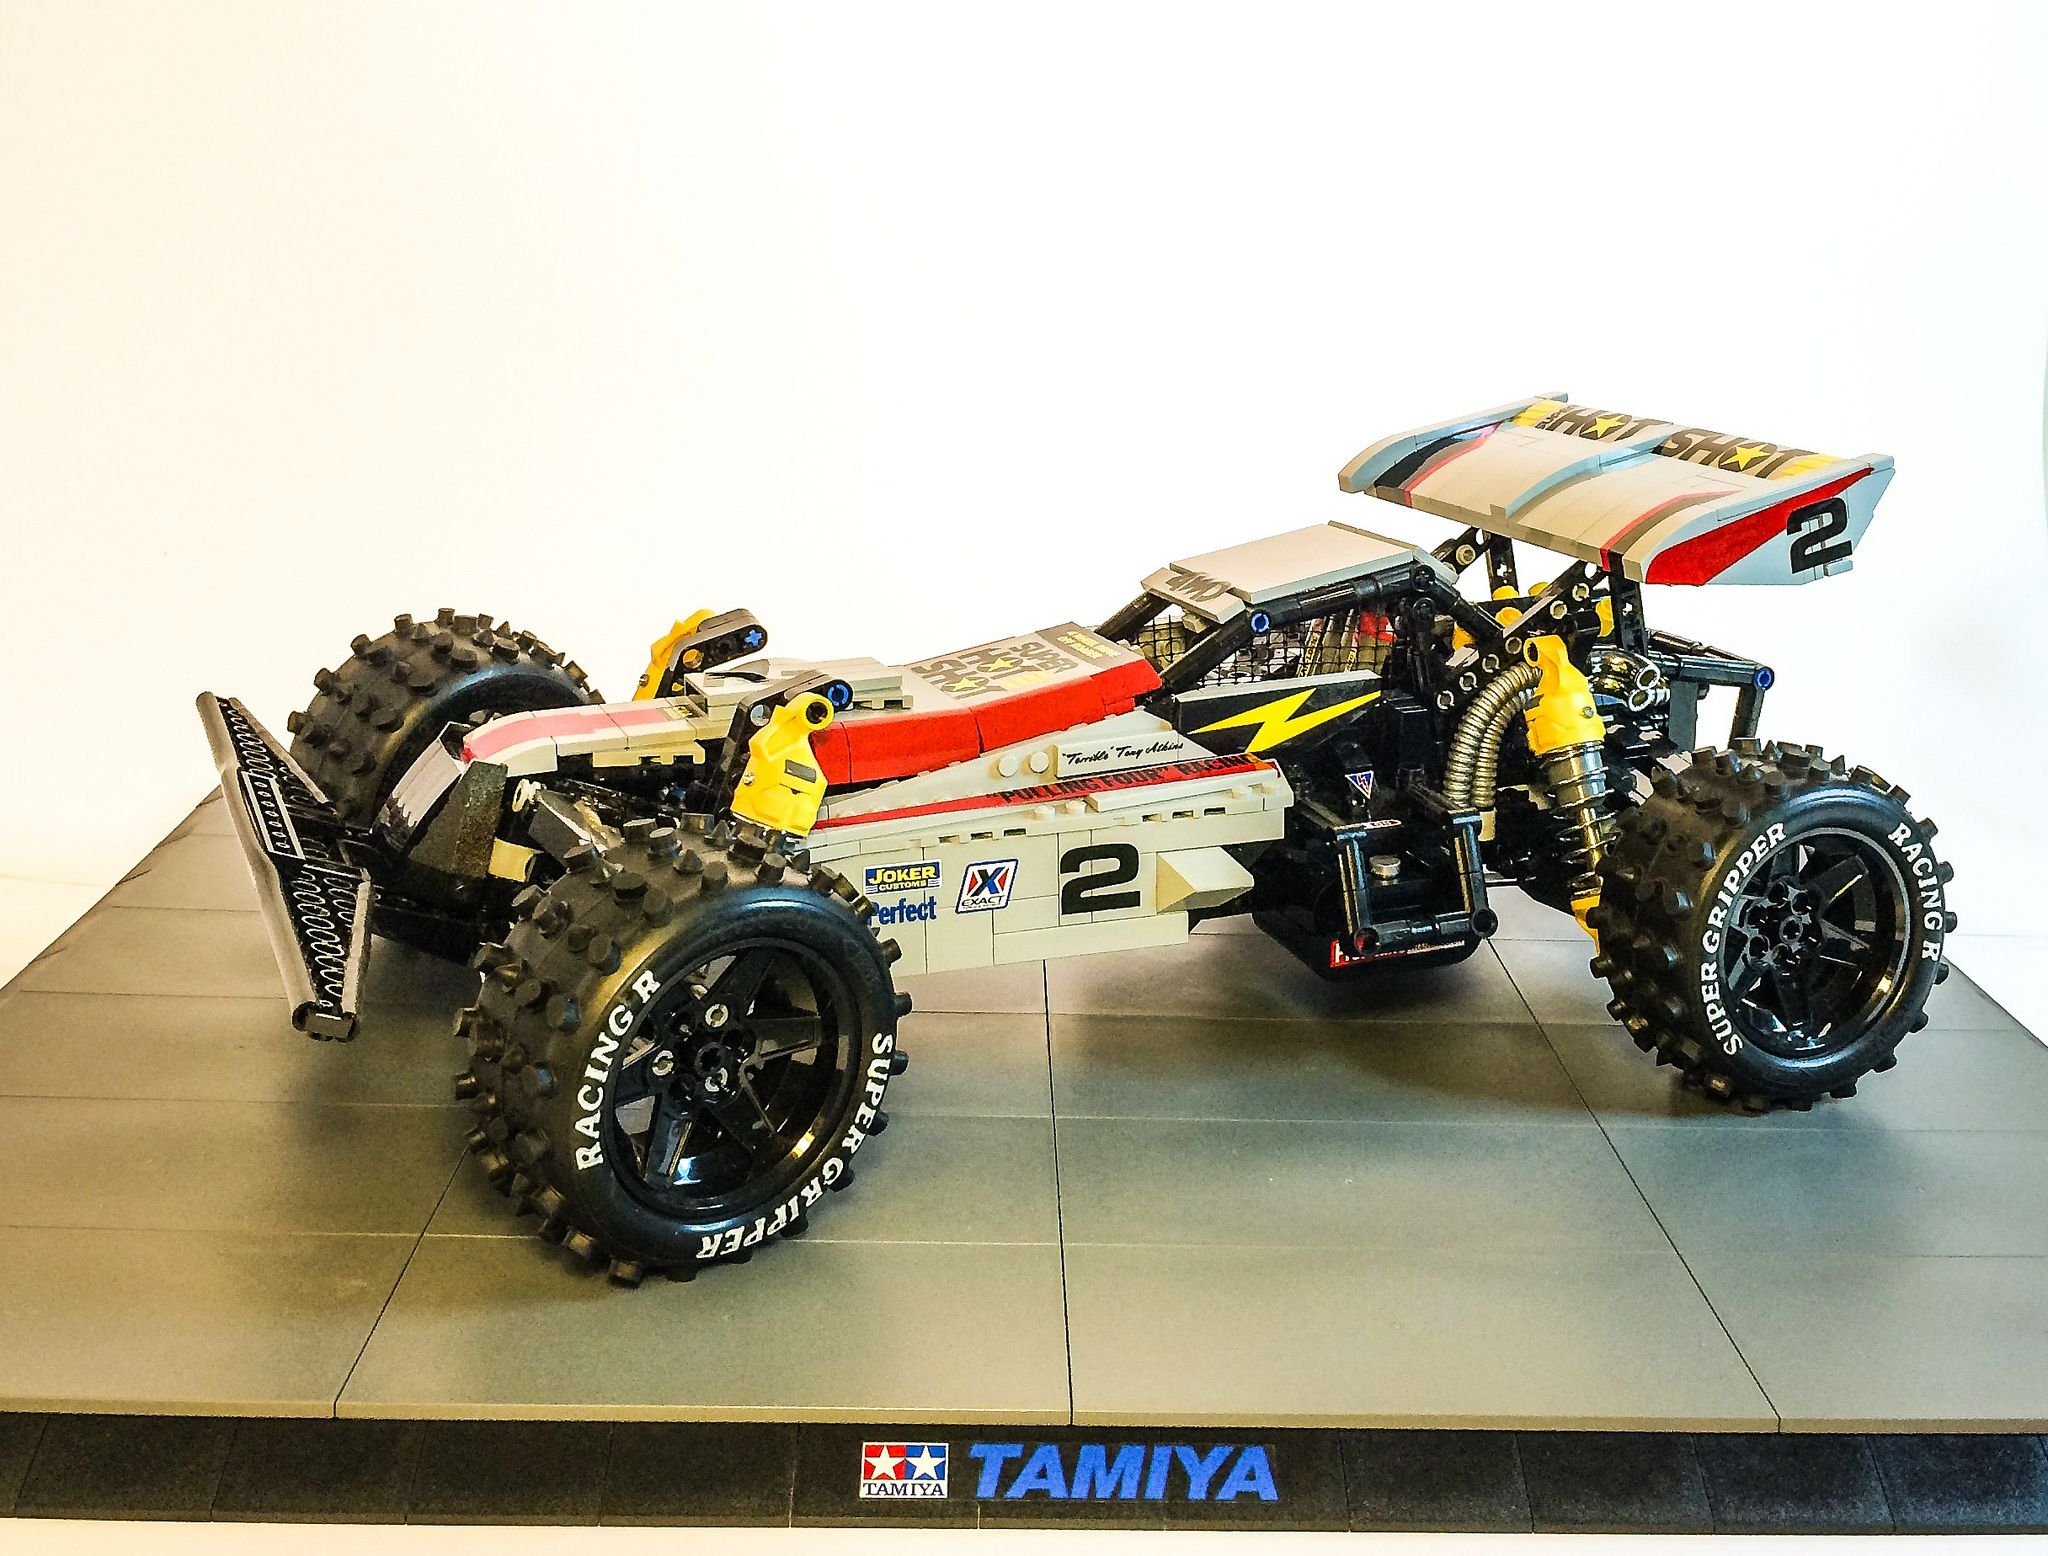 Lego Tamiya Super Hotshot